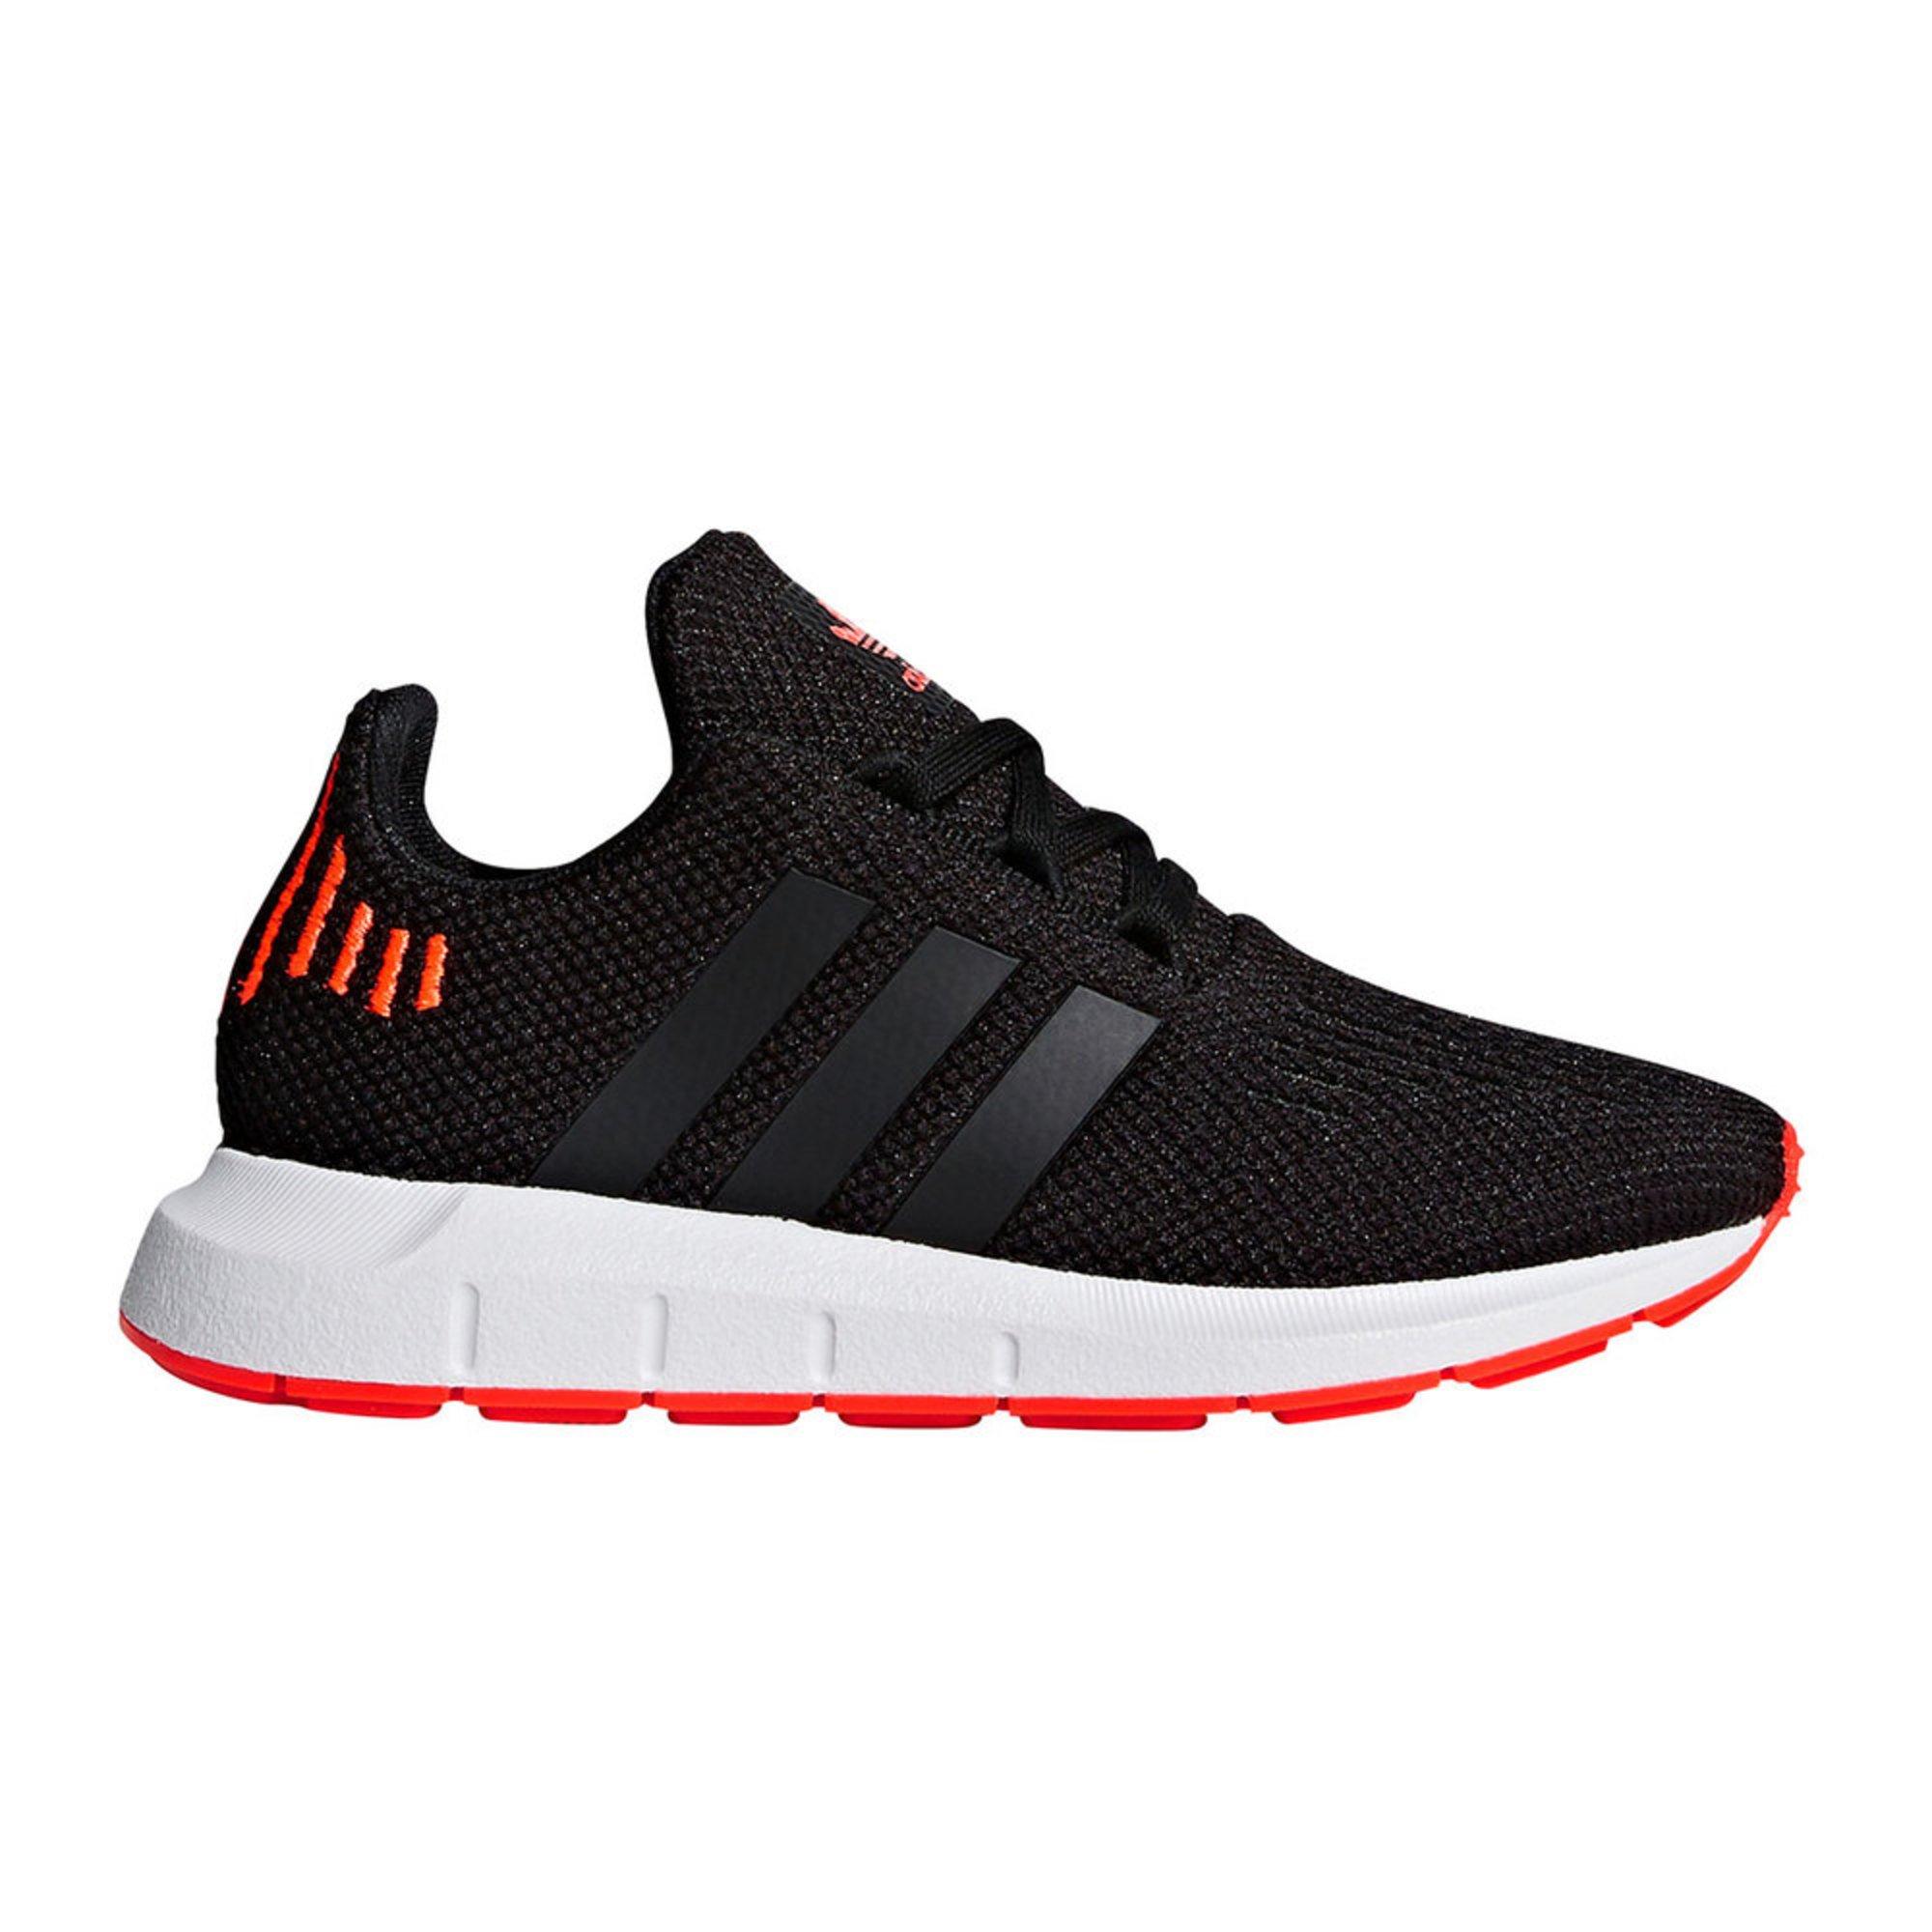 chaussures de séparation cfb18 bfb08 Adidas Swift Run C Boys Running Shoeblacksolar | Little Kid ...